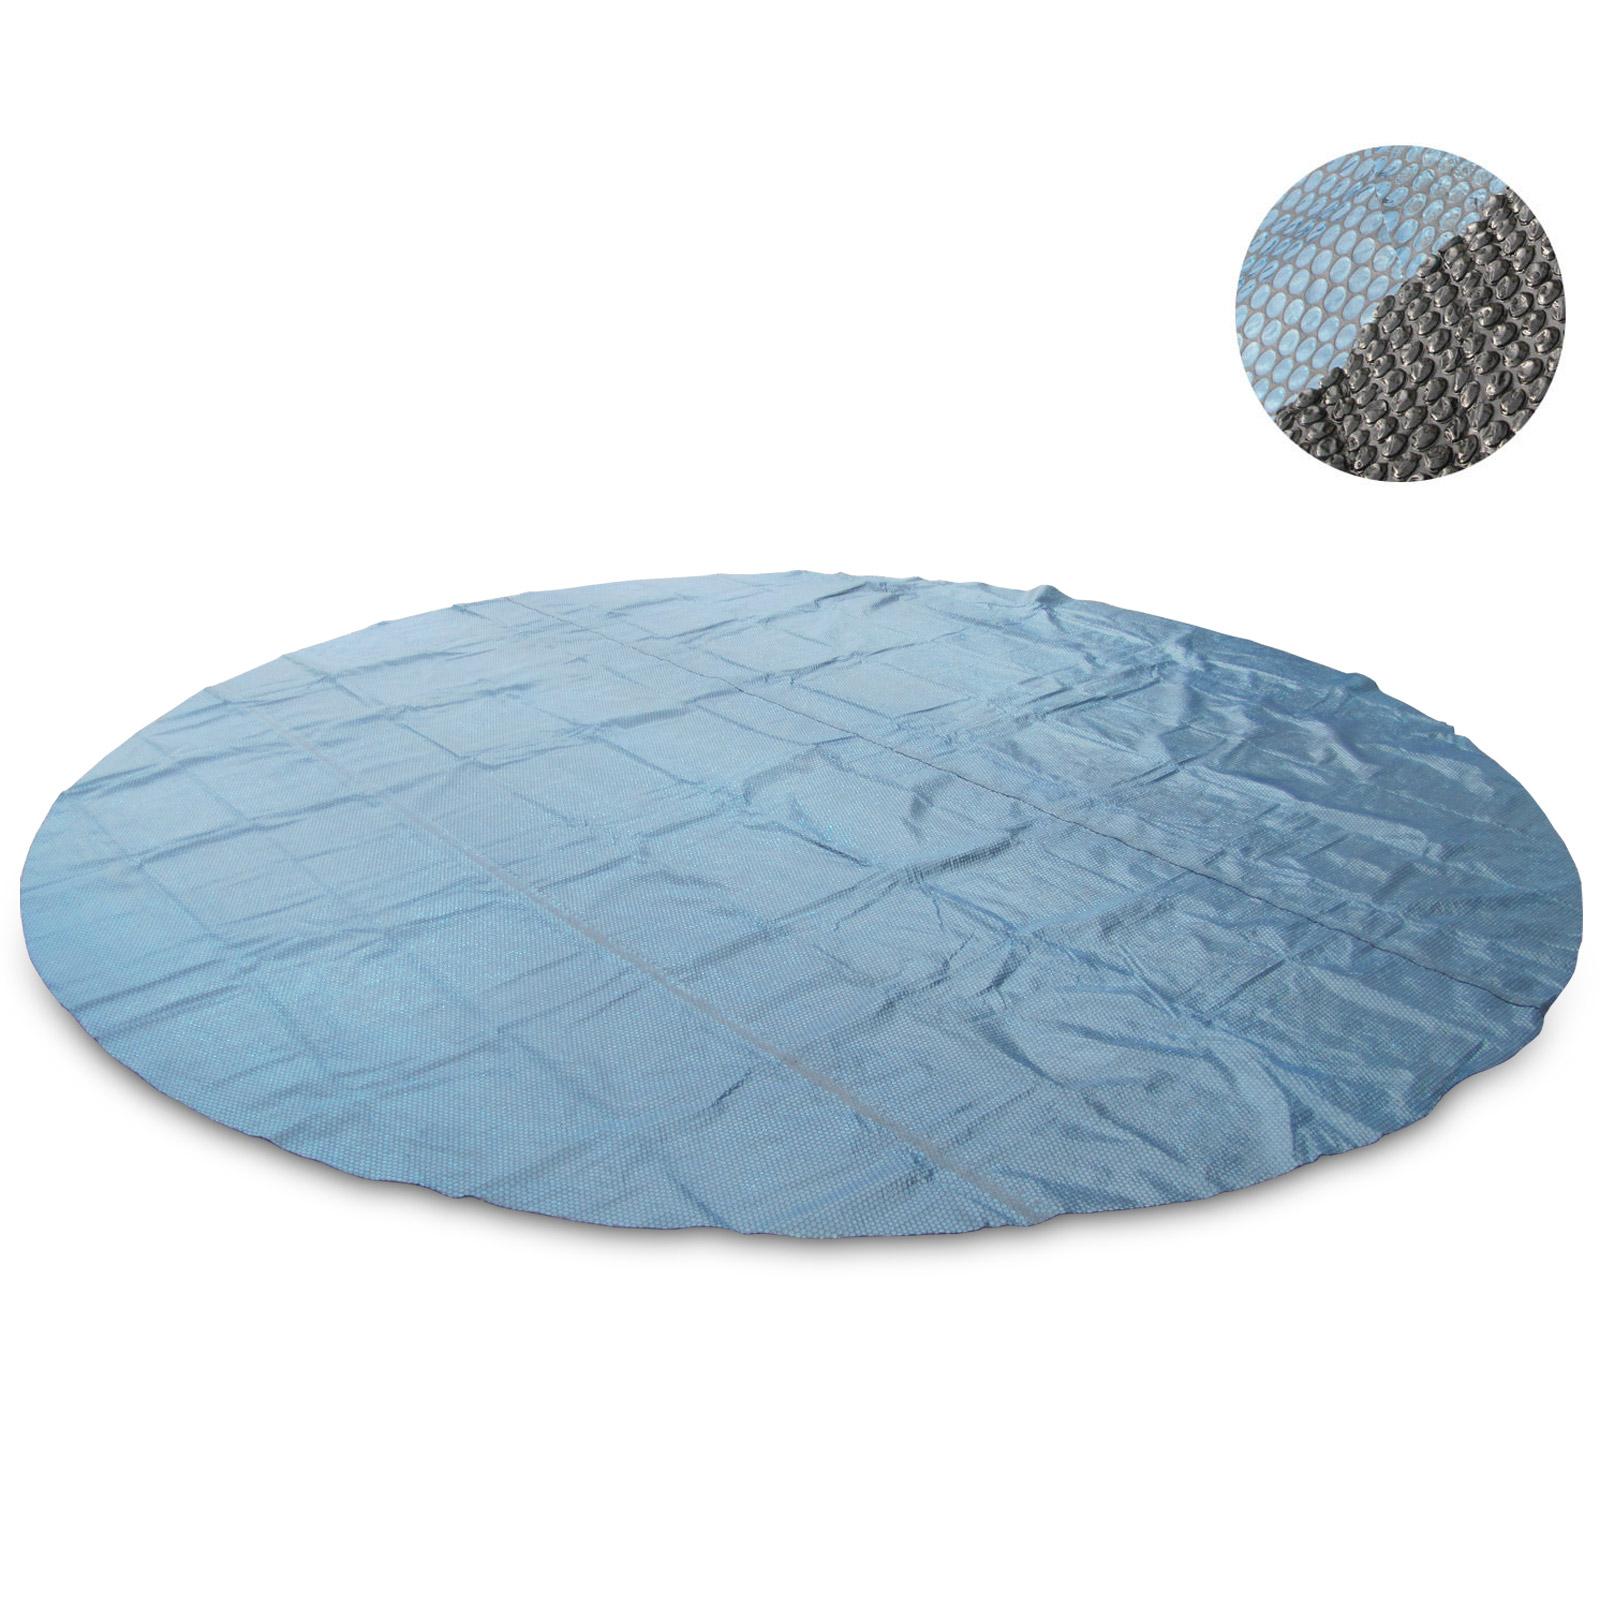 intex 366x122 komplettset swimming pool schwimmbad frame. Black Bedroom Furniture Sets. Home Design Ideas